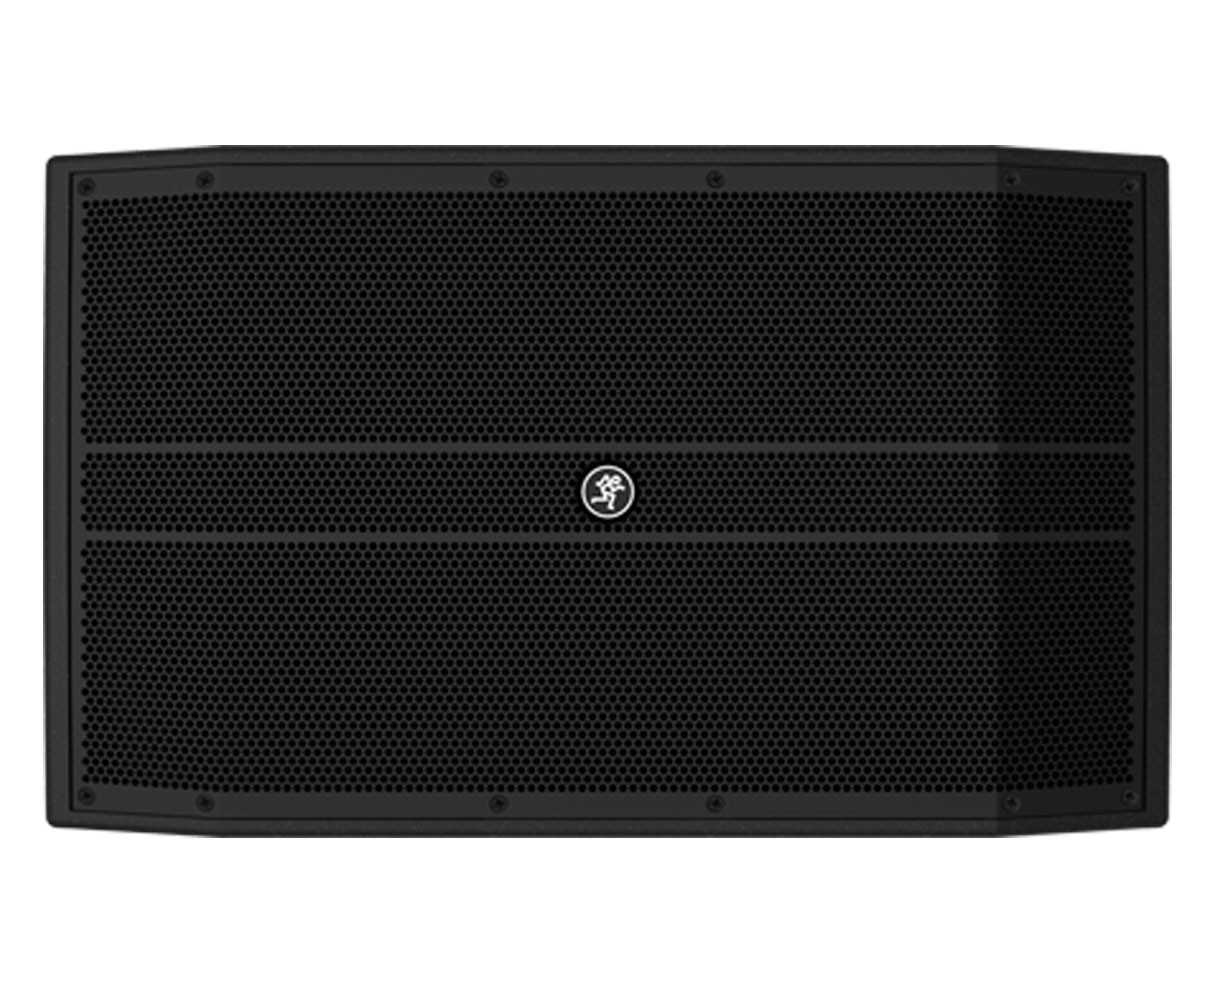 "Mackie DRM12A-P 12""ArrayablePassive Loudspeaker"